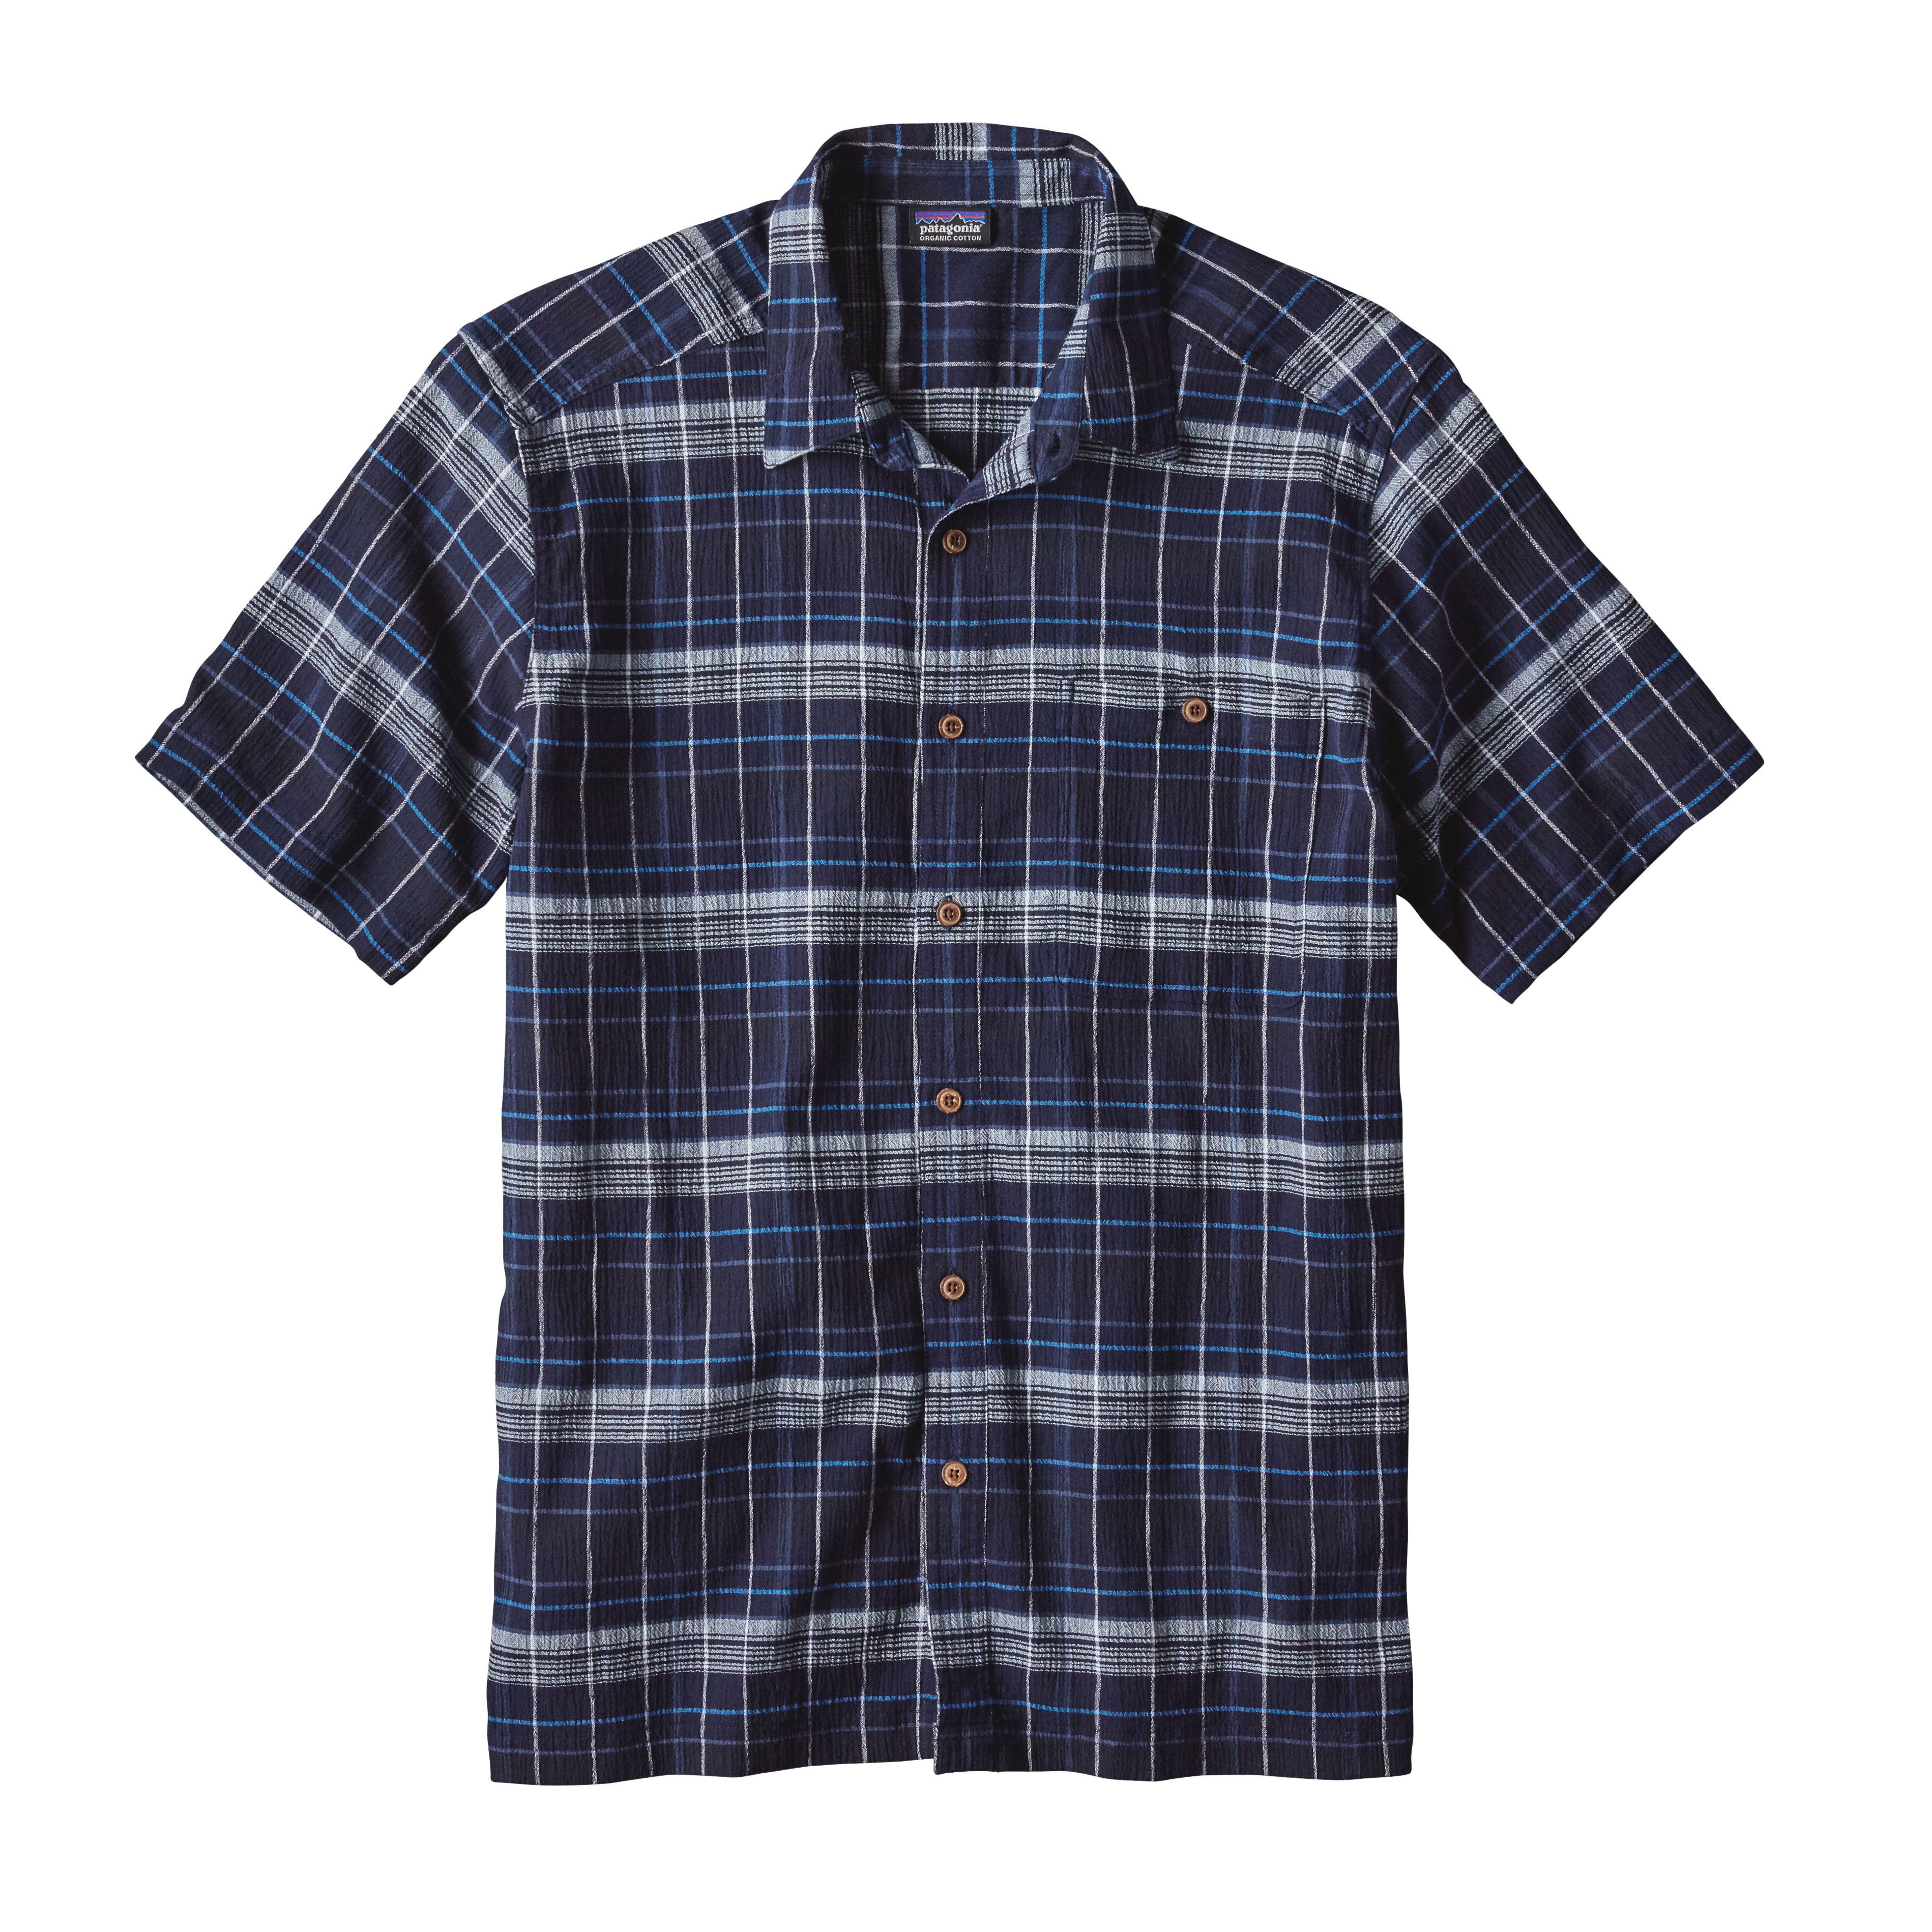 Patagonia A/C Shirt - Outdoor Hemd - Herren